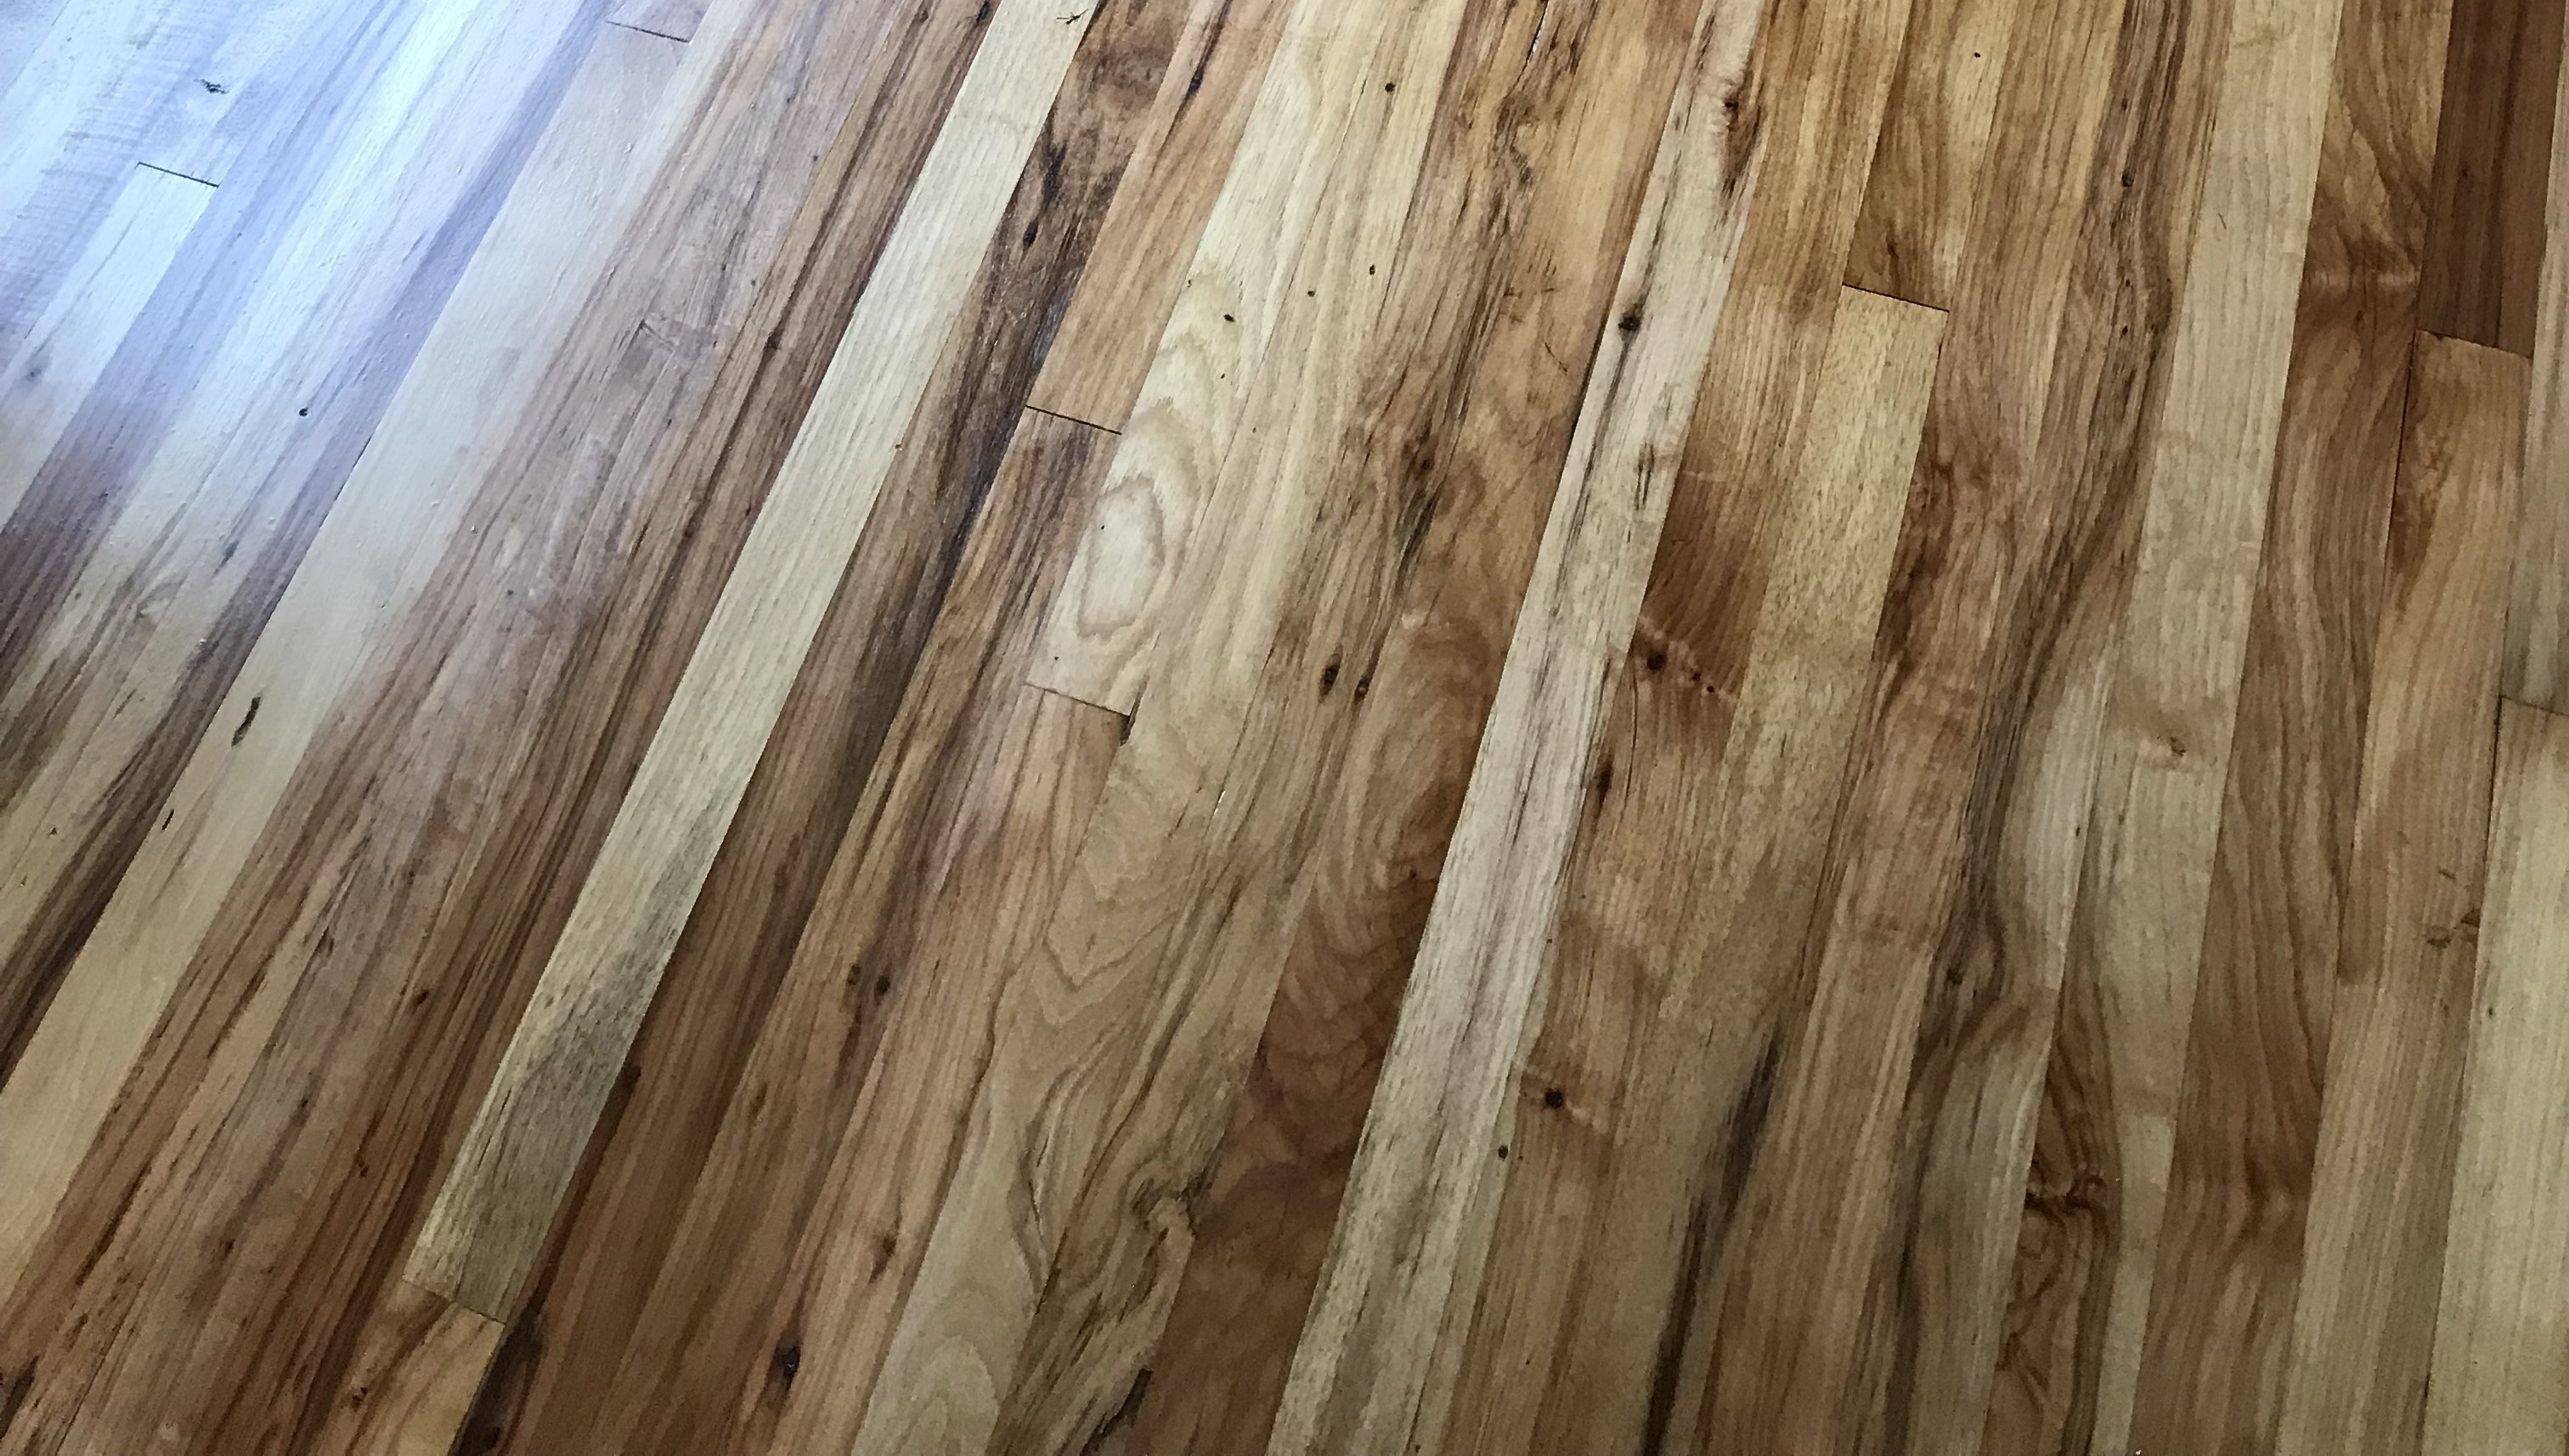 refinishing hardwood floors drum sander of refinishing hardwood floors carlhaven made in refinishing hardwood floors